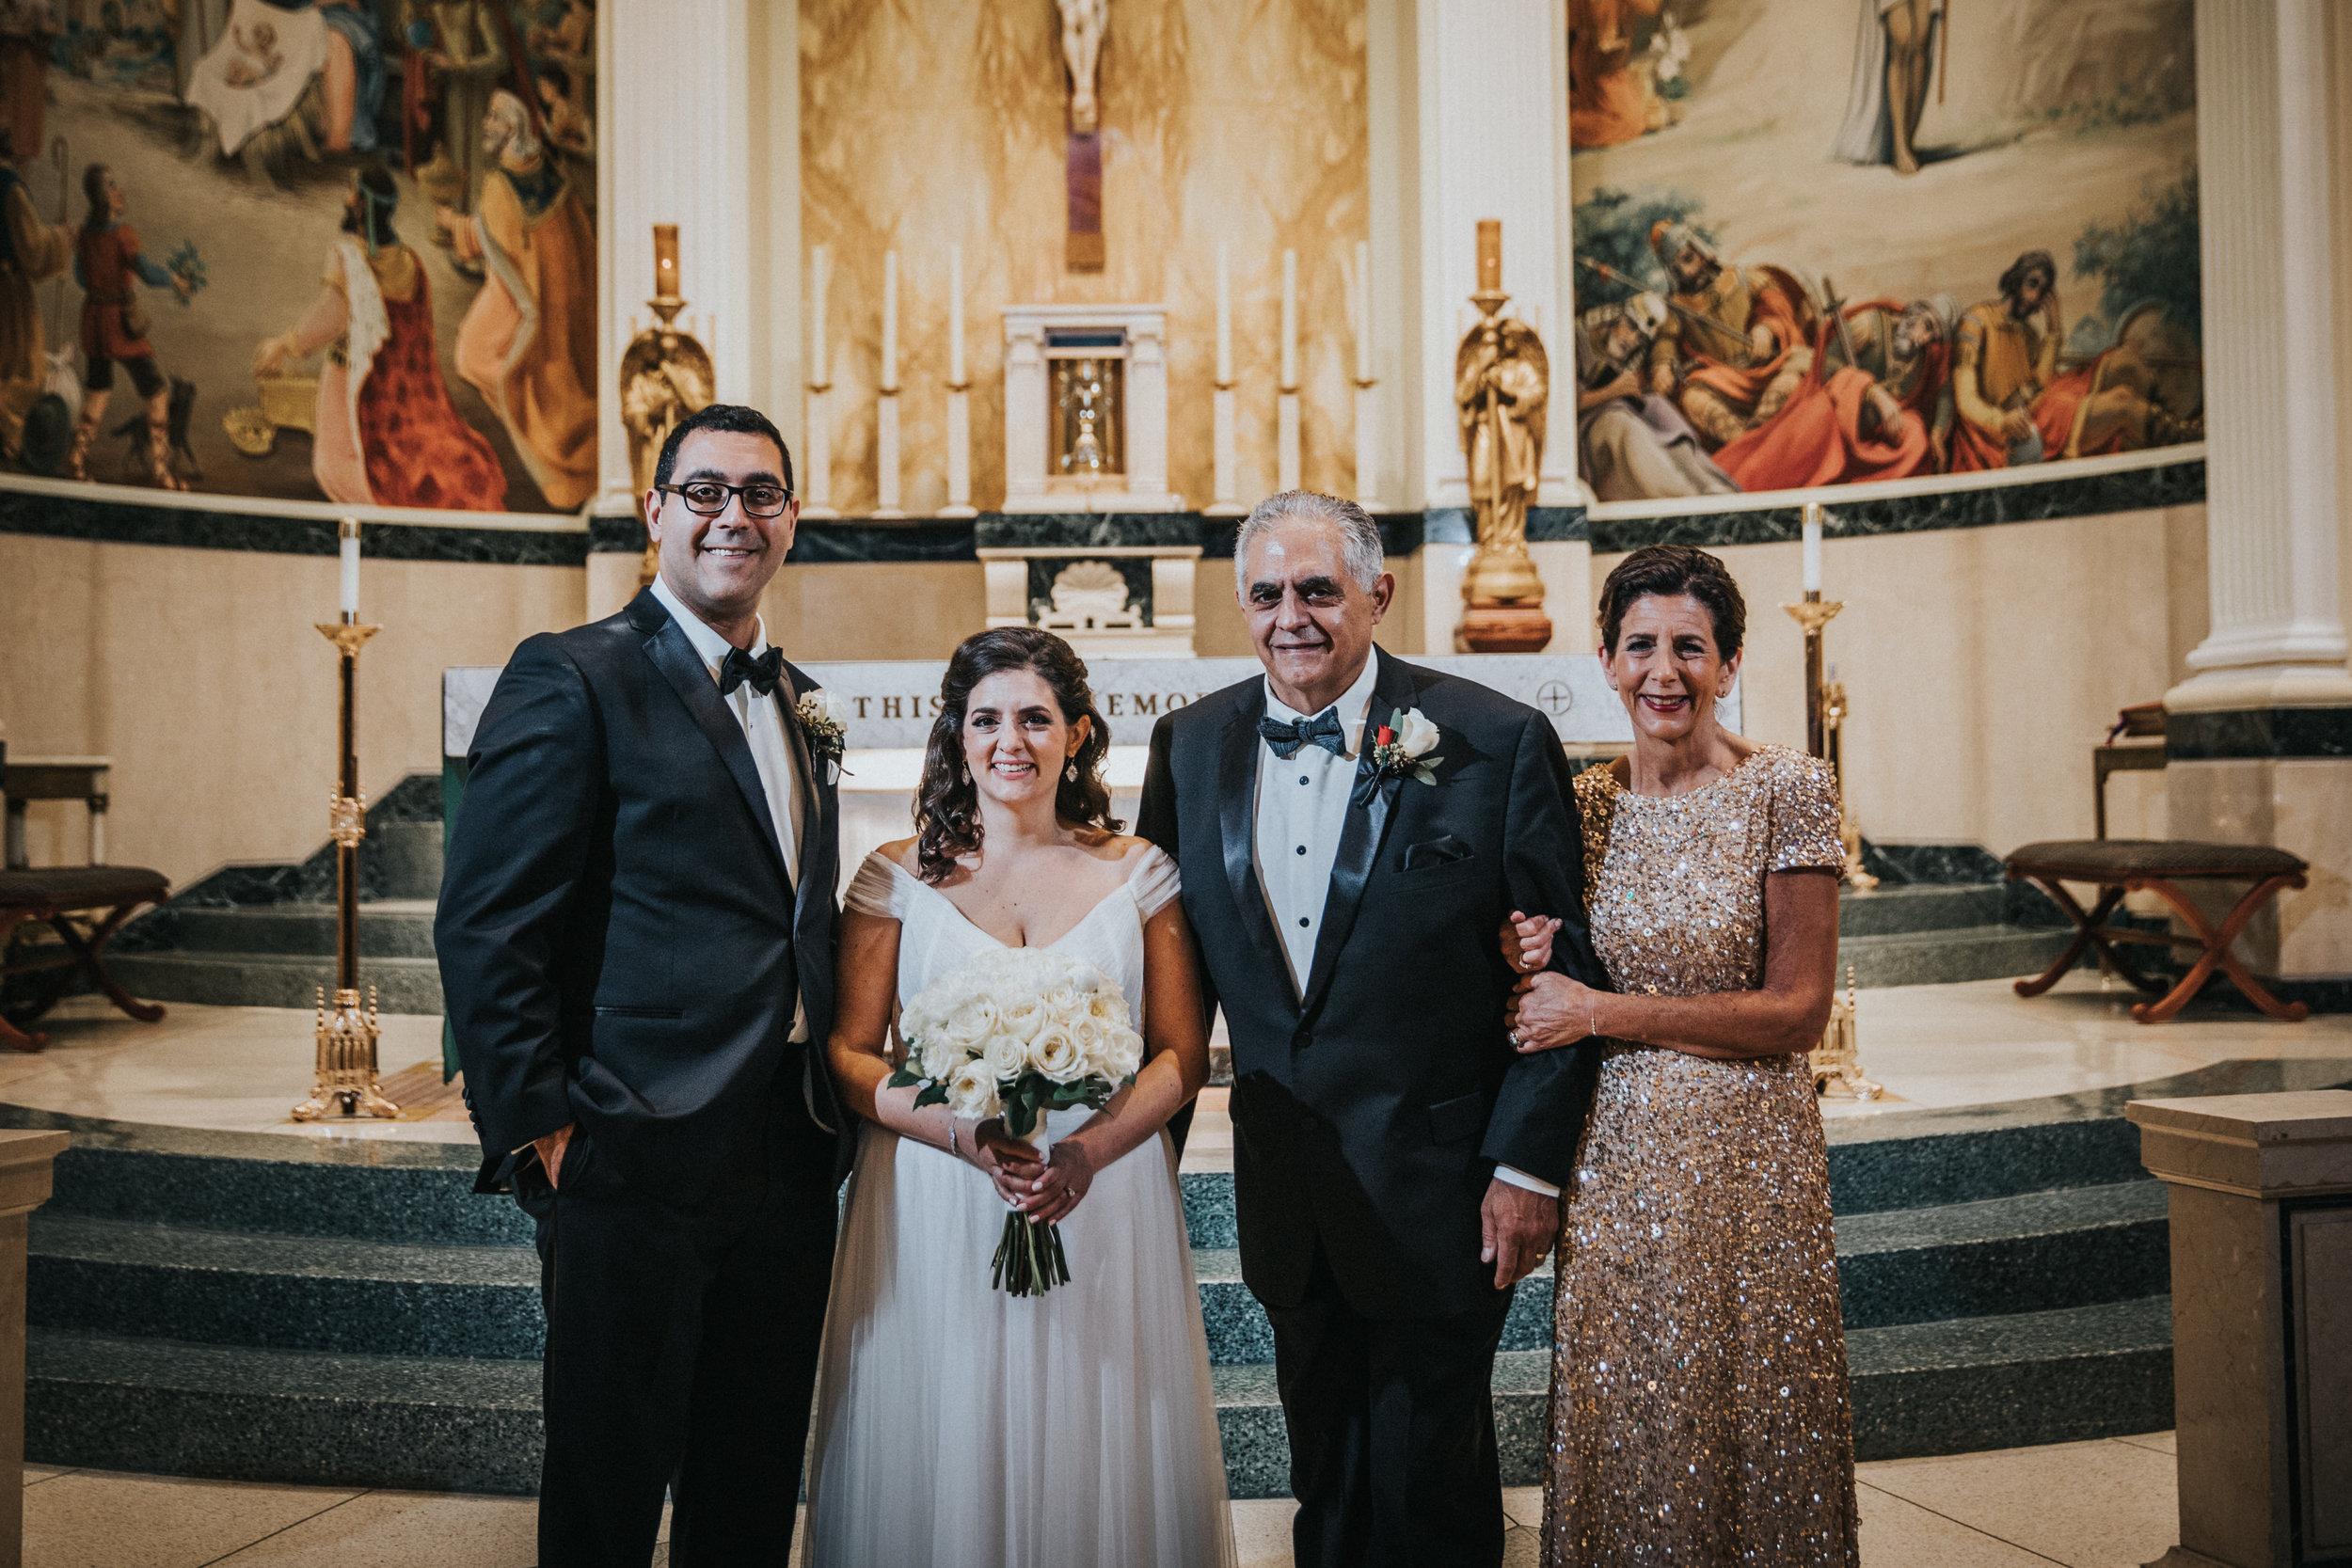 JennaLynnPhotography-NJWeddingPhotographer-Philadelphia-Wedding-ArtsBallroom-Family-12.jpg